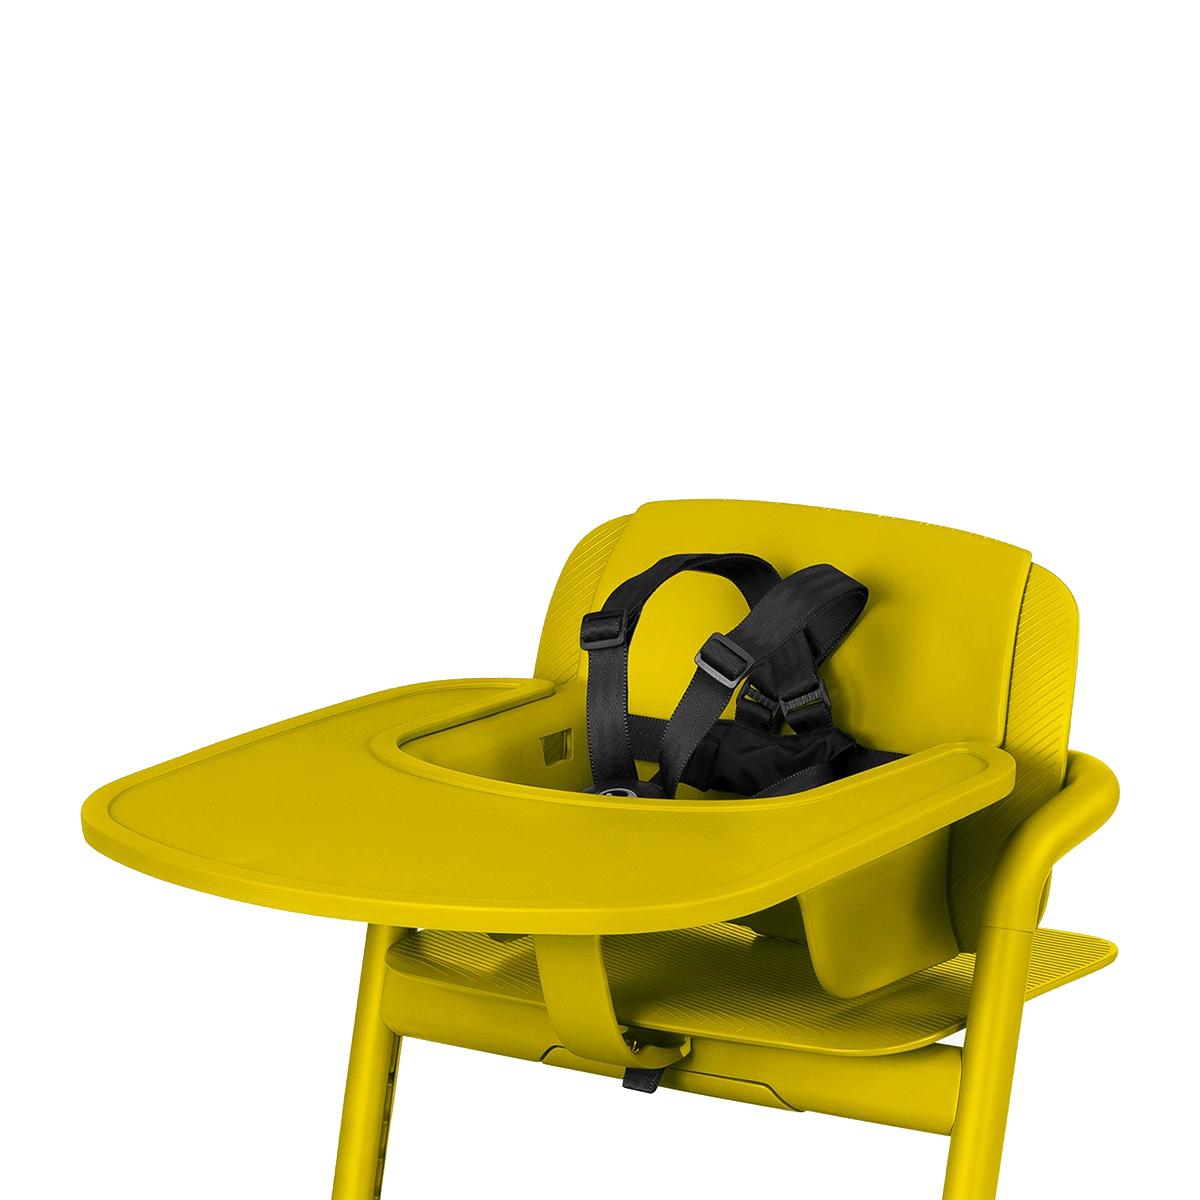 Chaise haute Plateau pour Chaise Haute Lemo - Canary Yellow